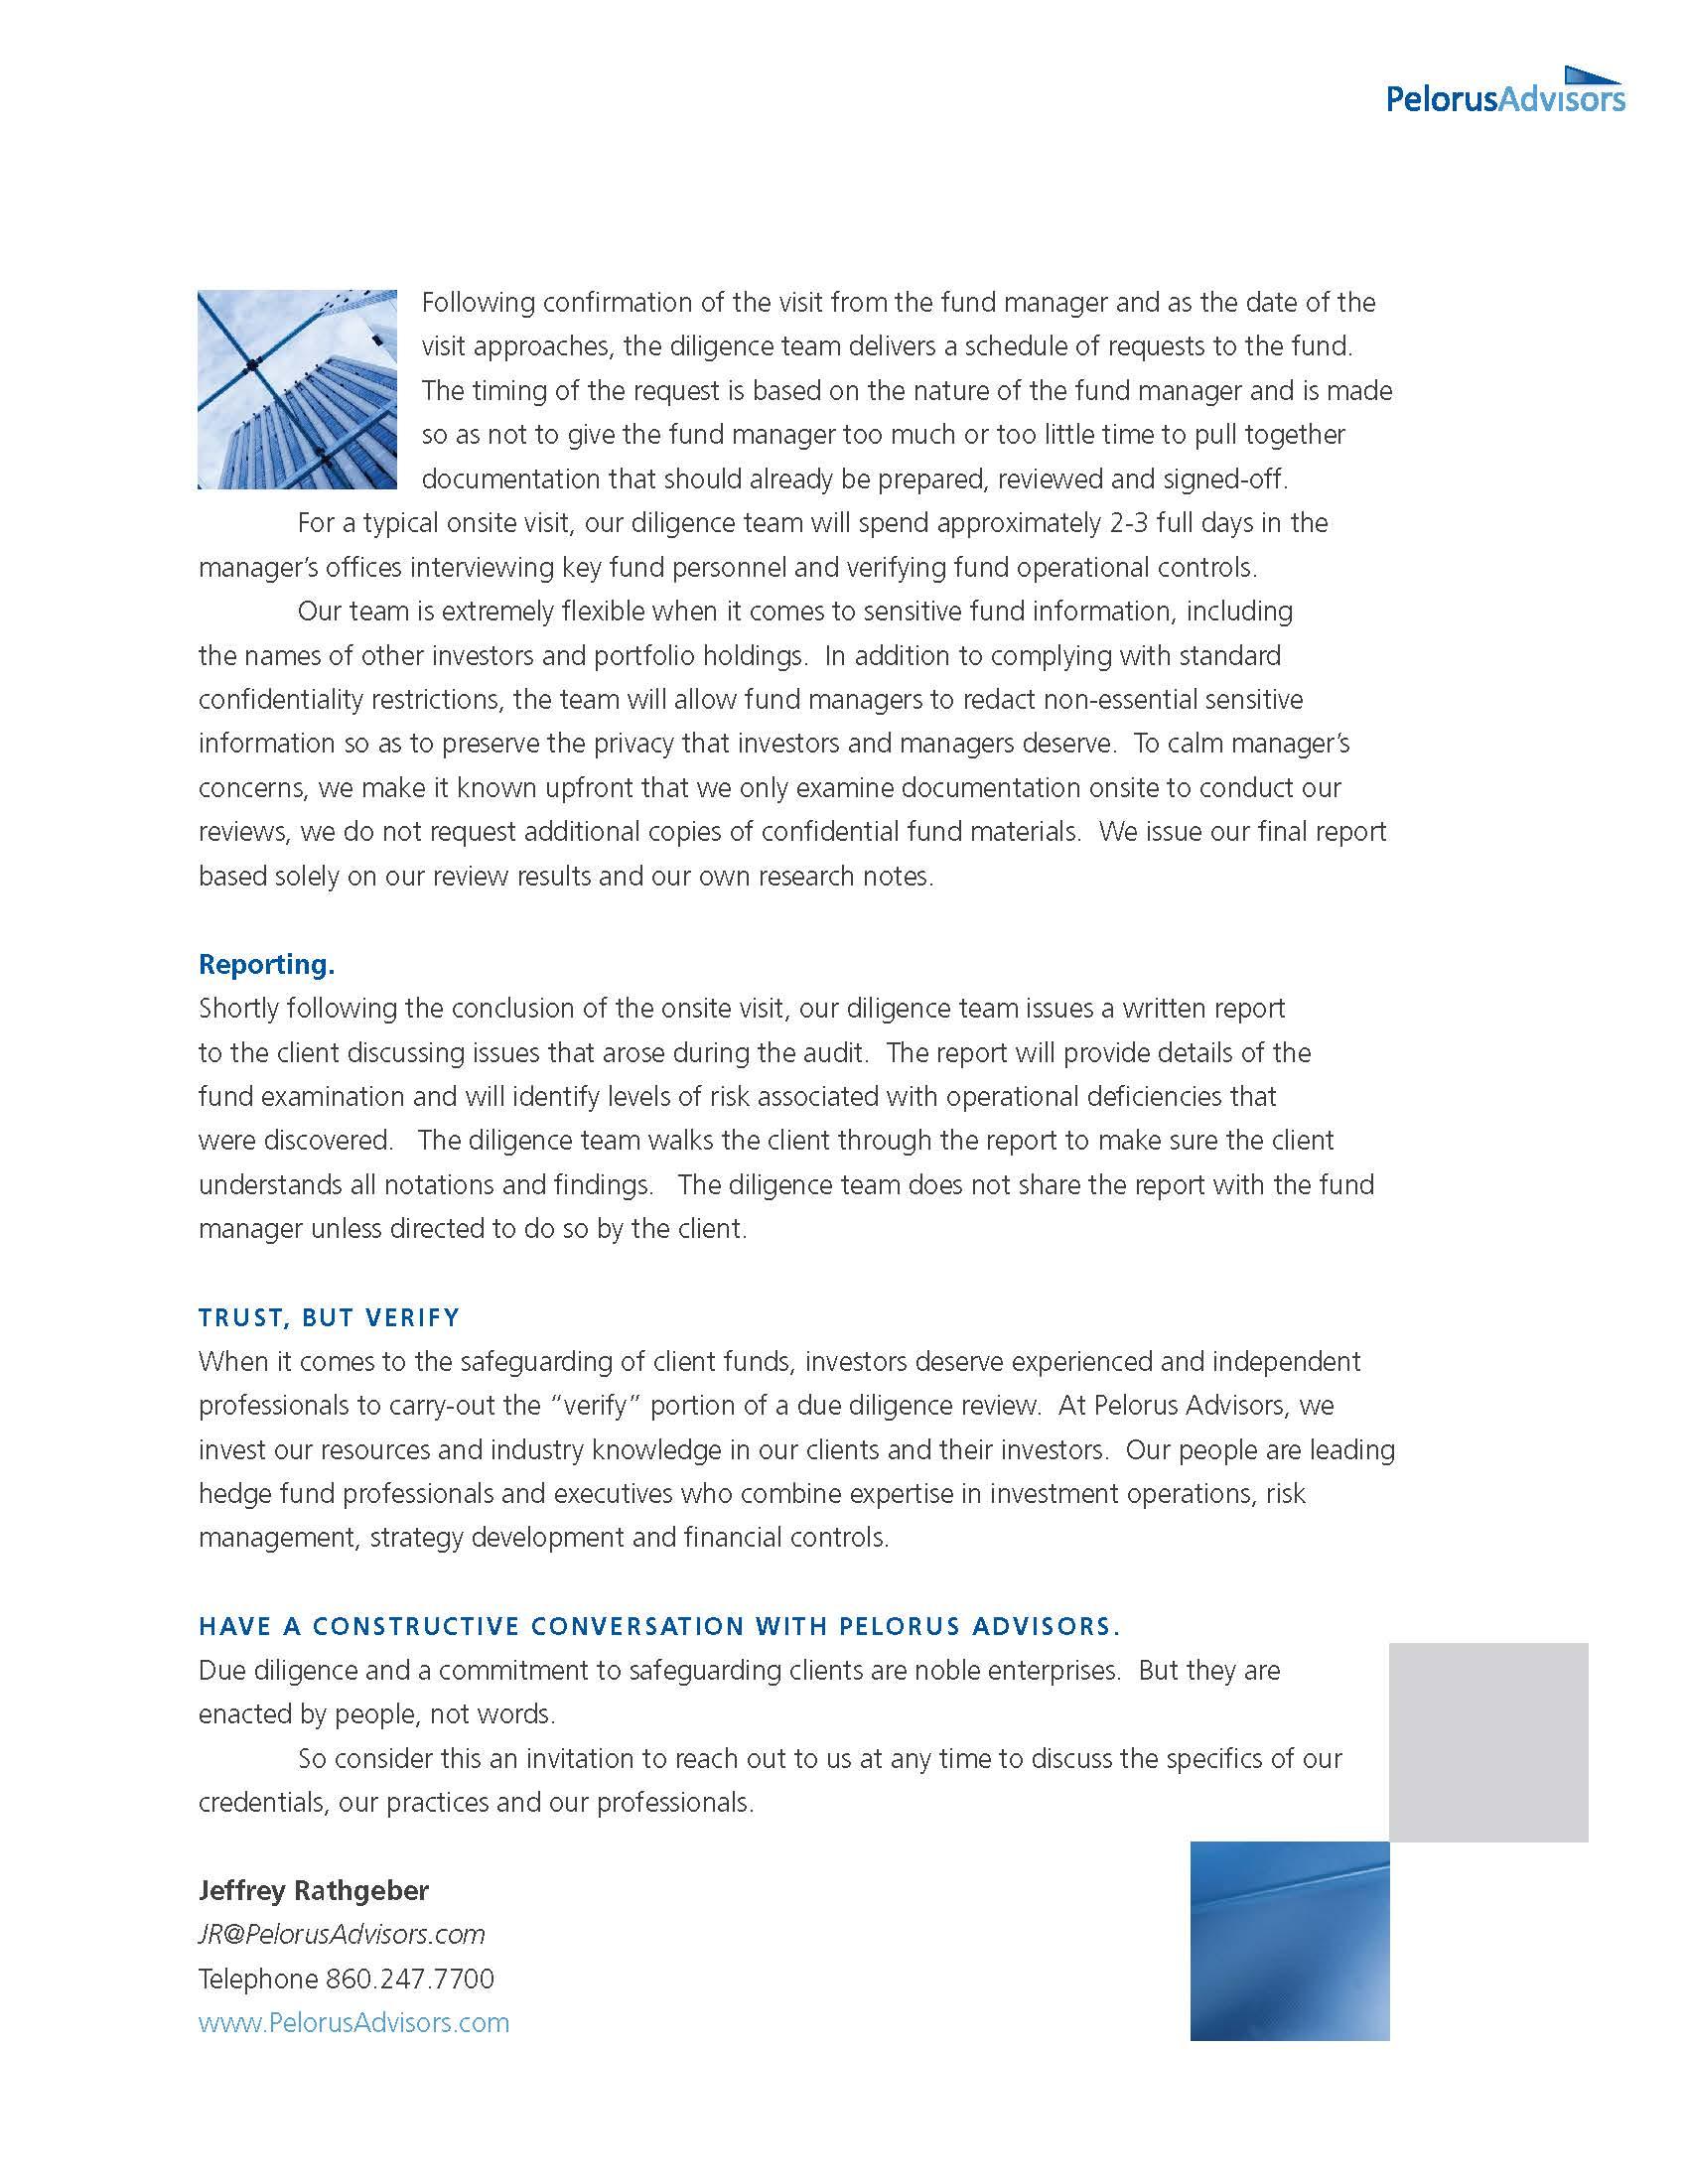 Hedge Fund Brochure